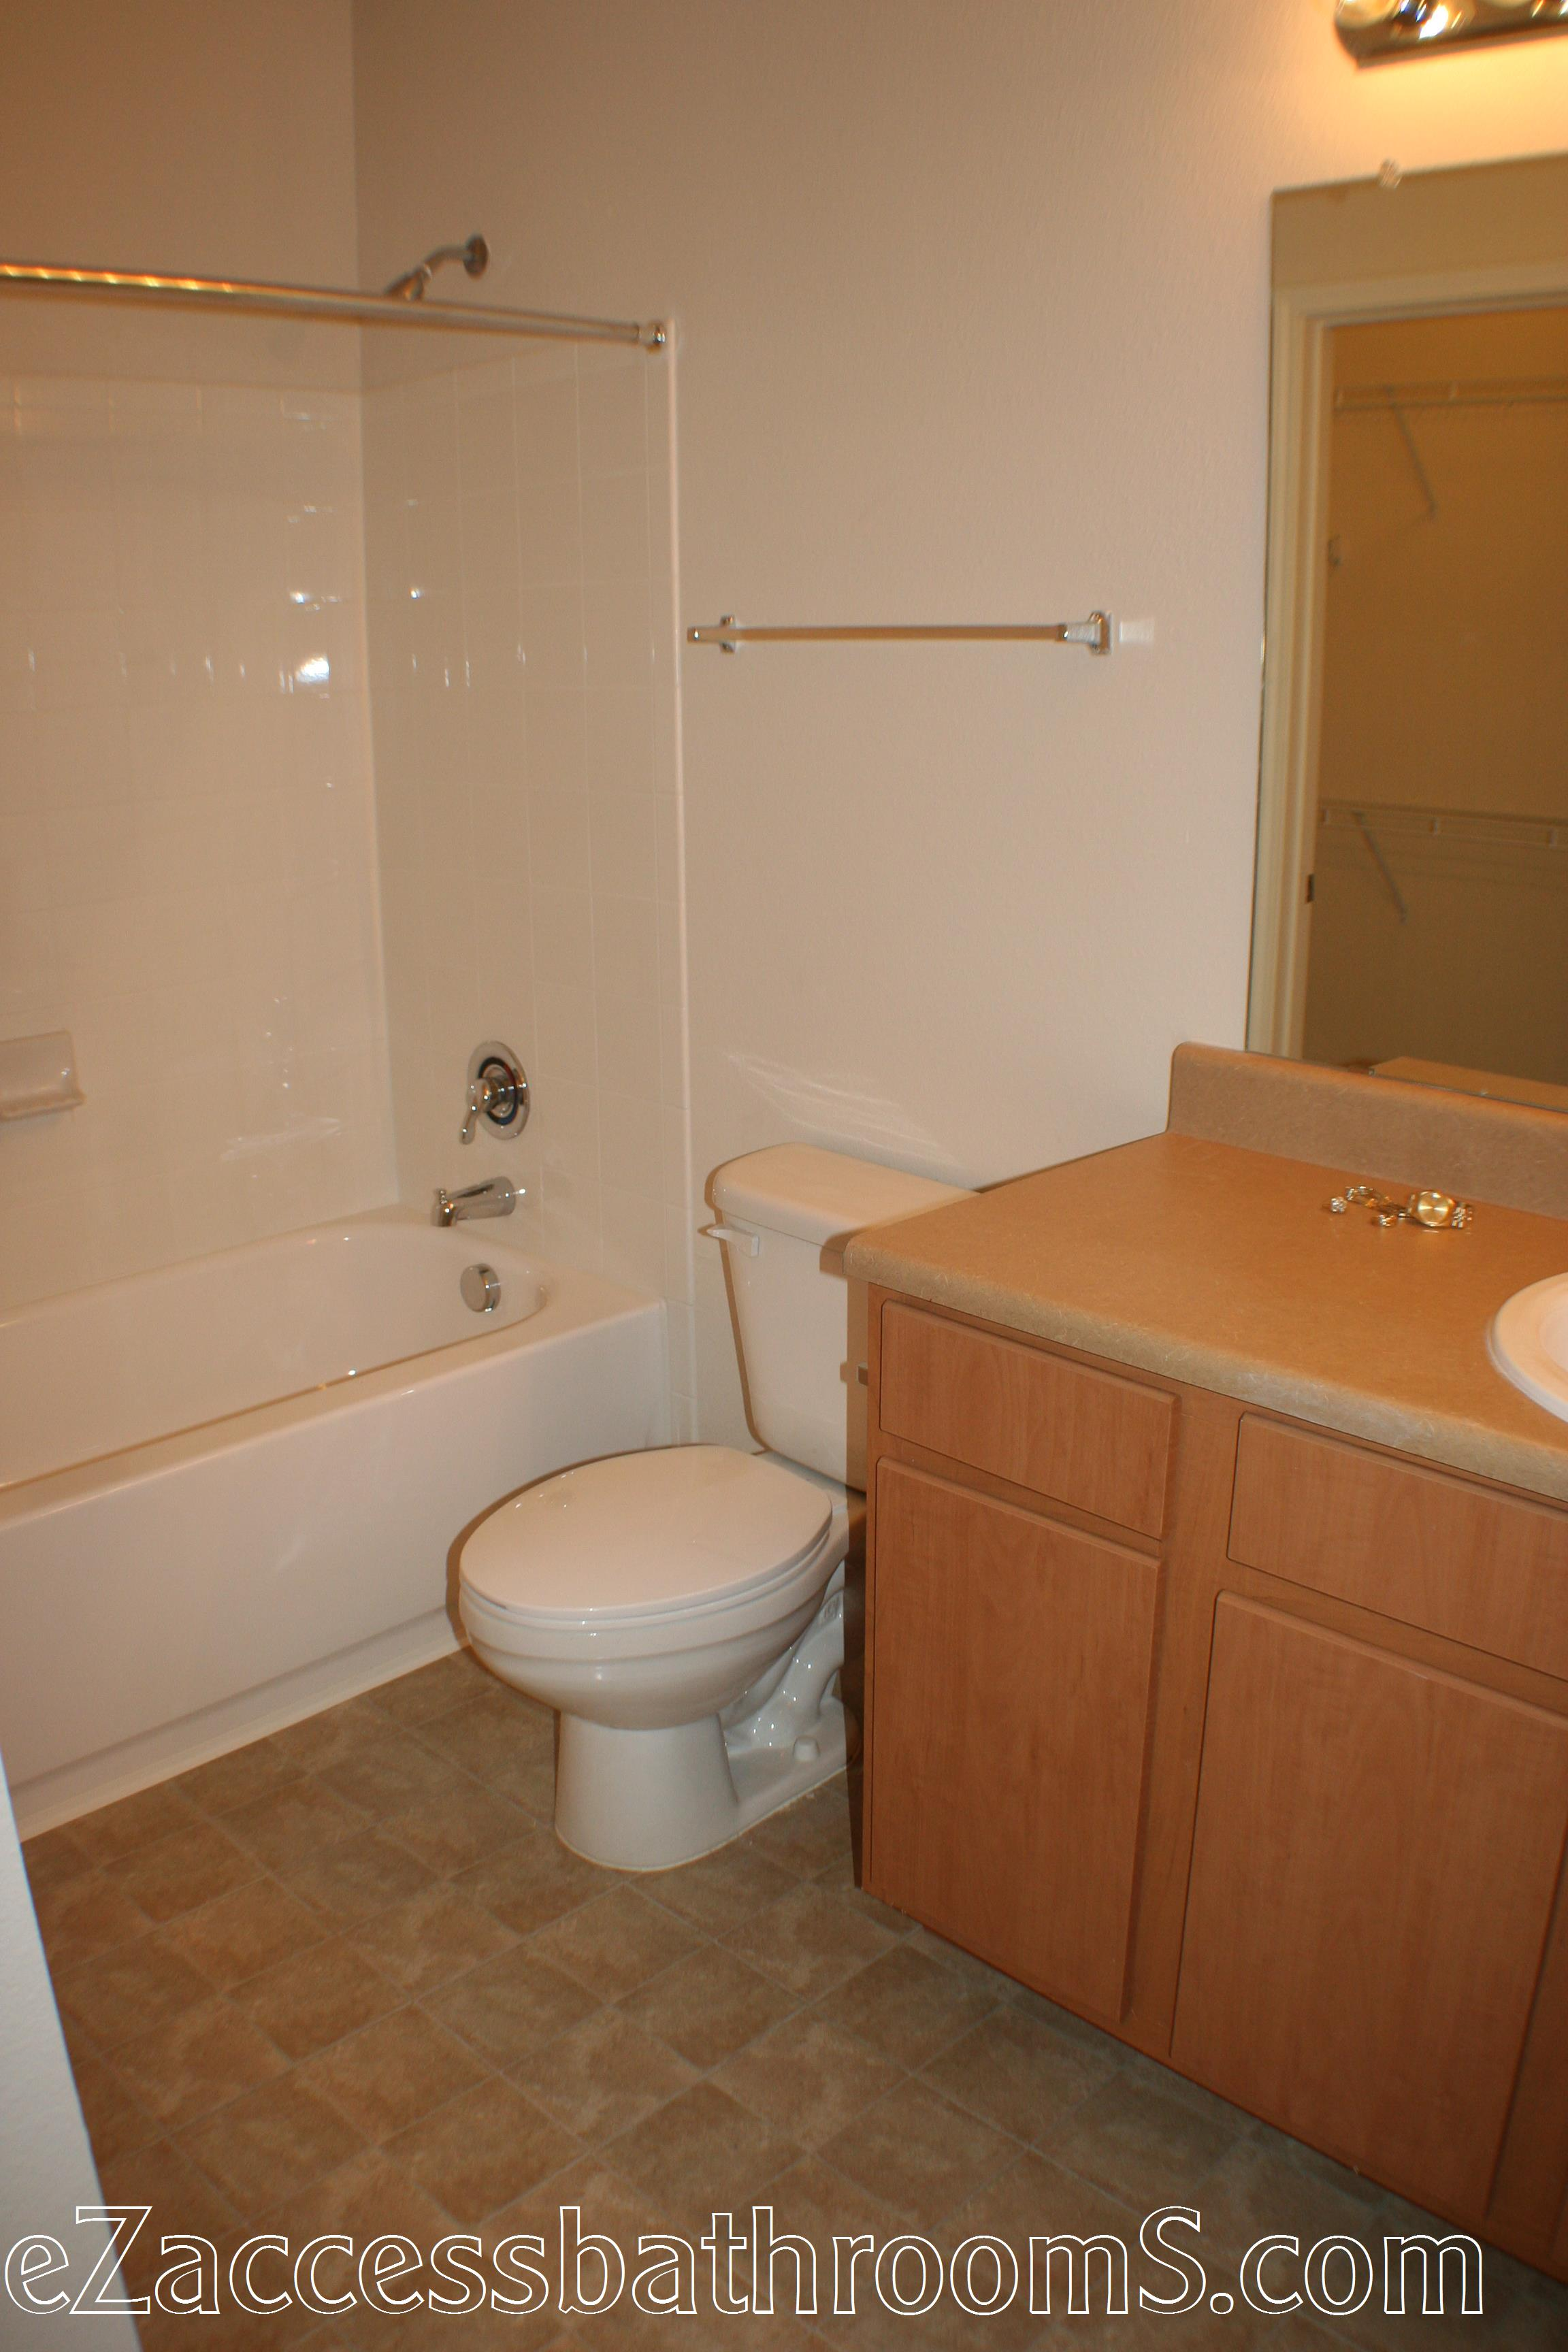 cheap tub to shower conversion ezaccessbathrooms.com 002.JPG